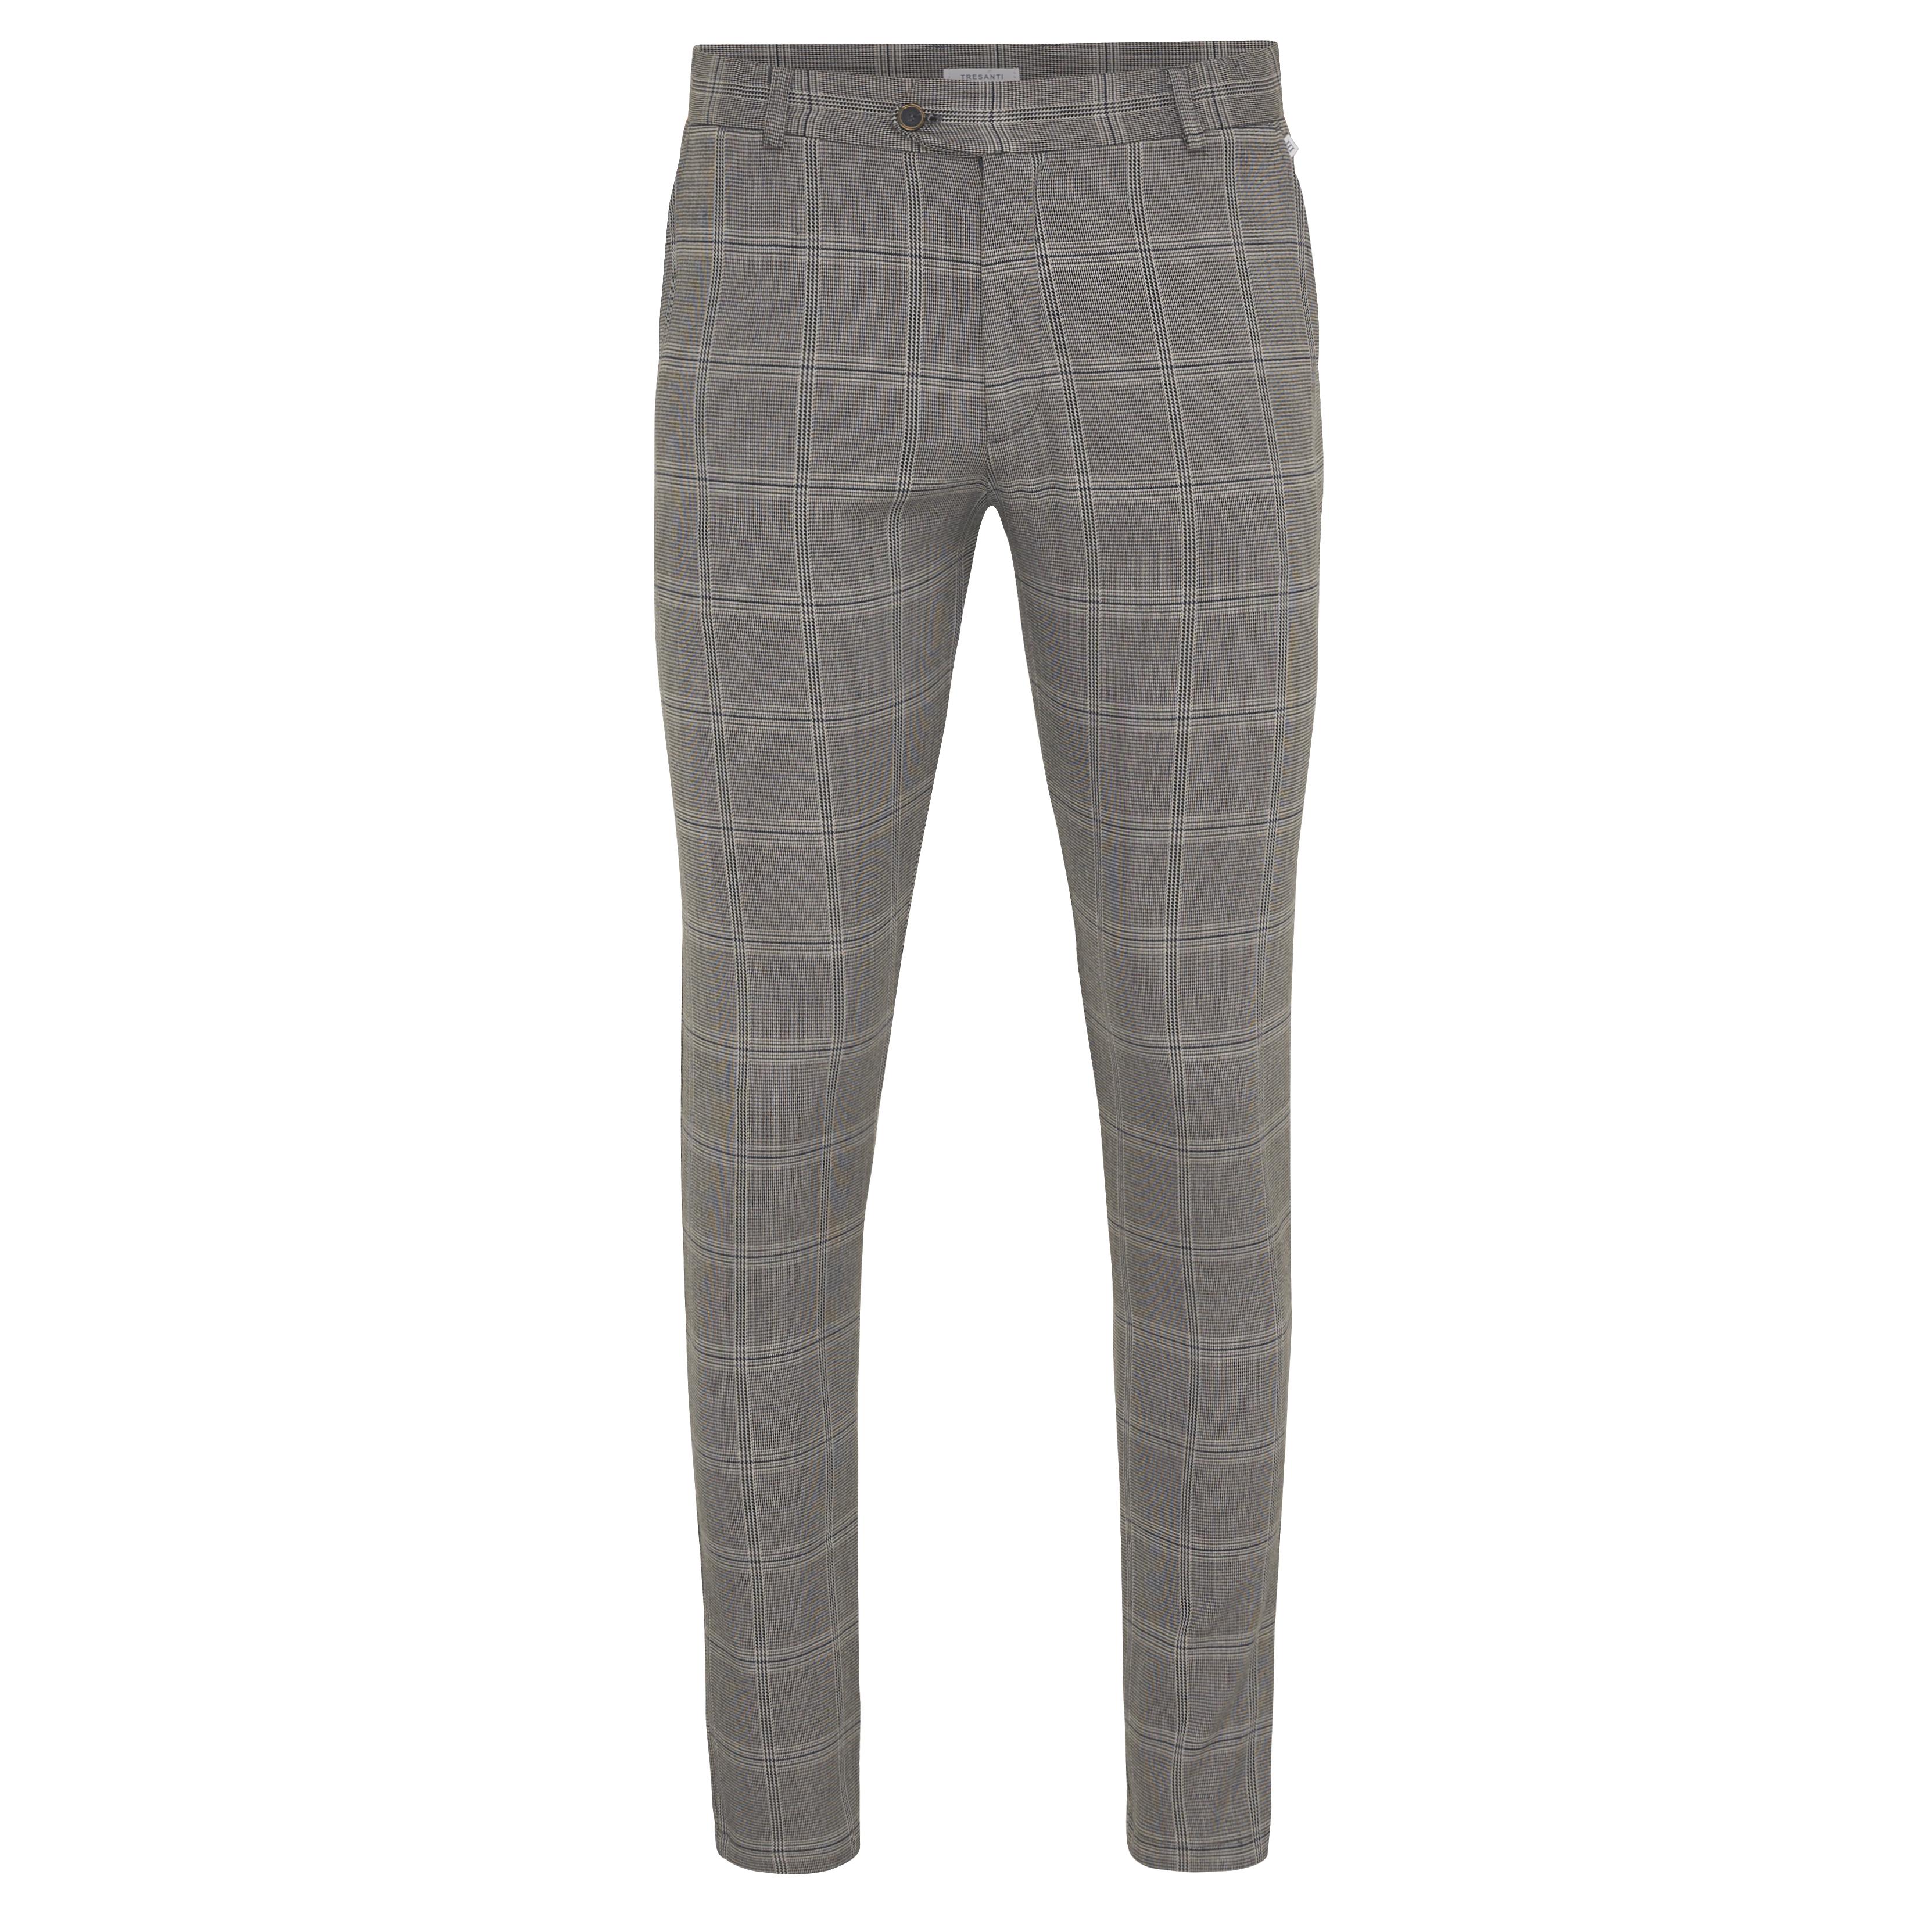 Jake | Trousers stretch prince de galles grey